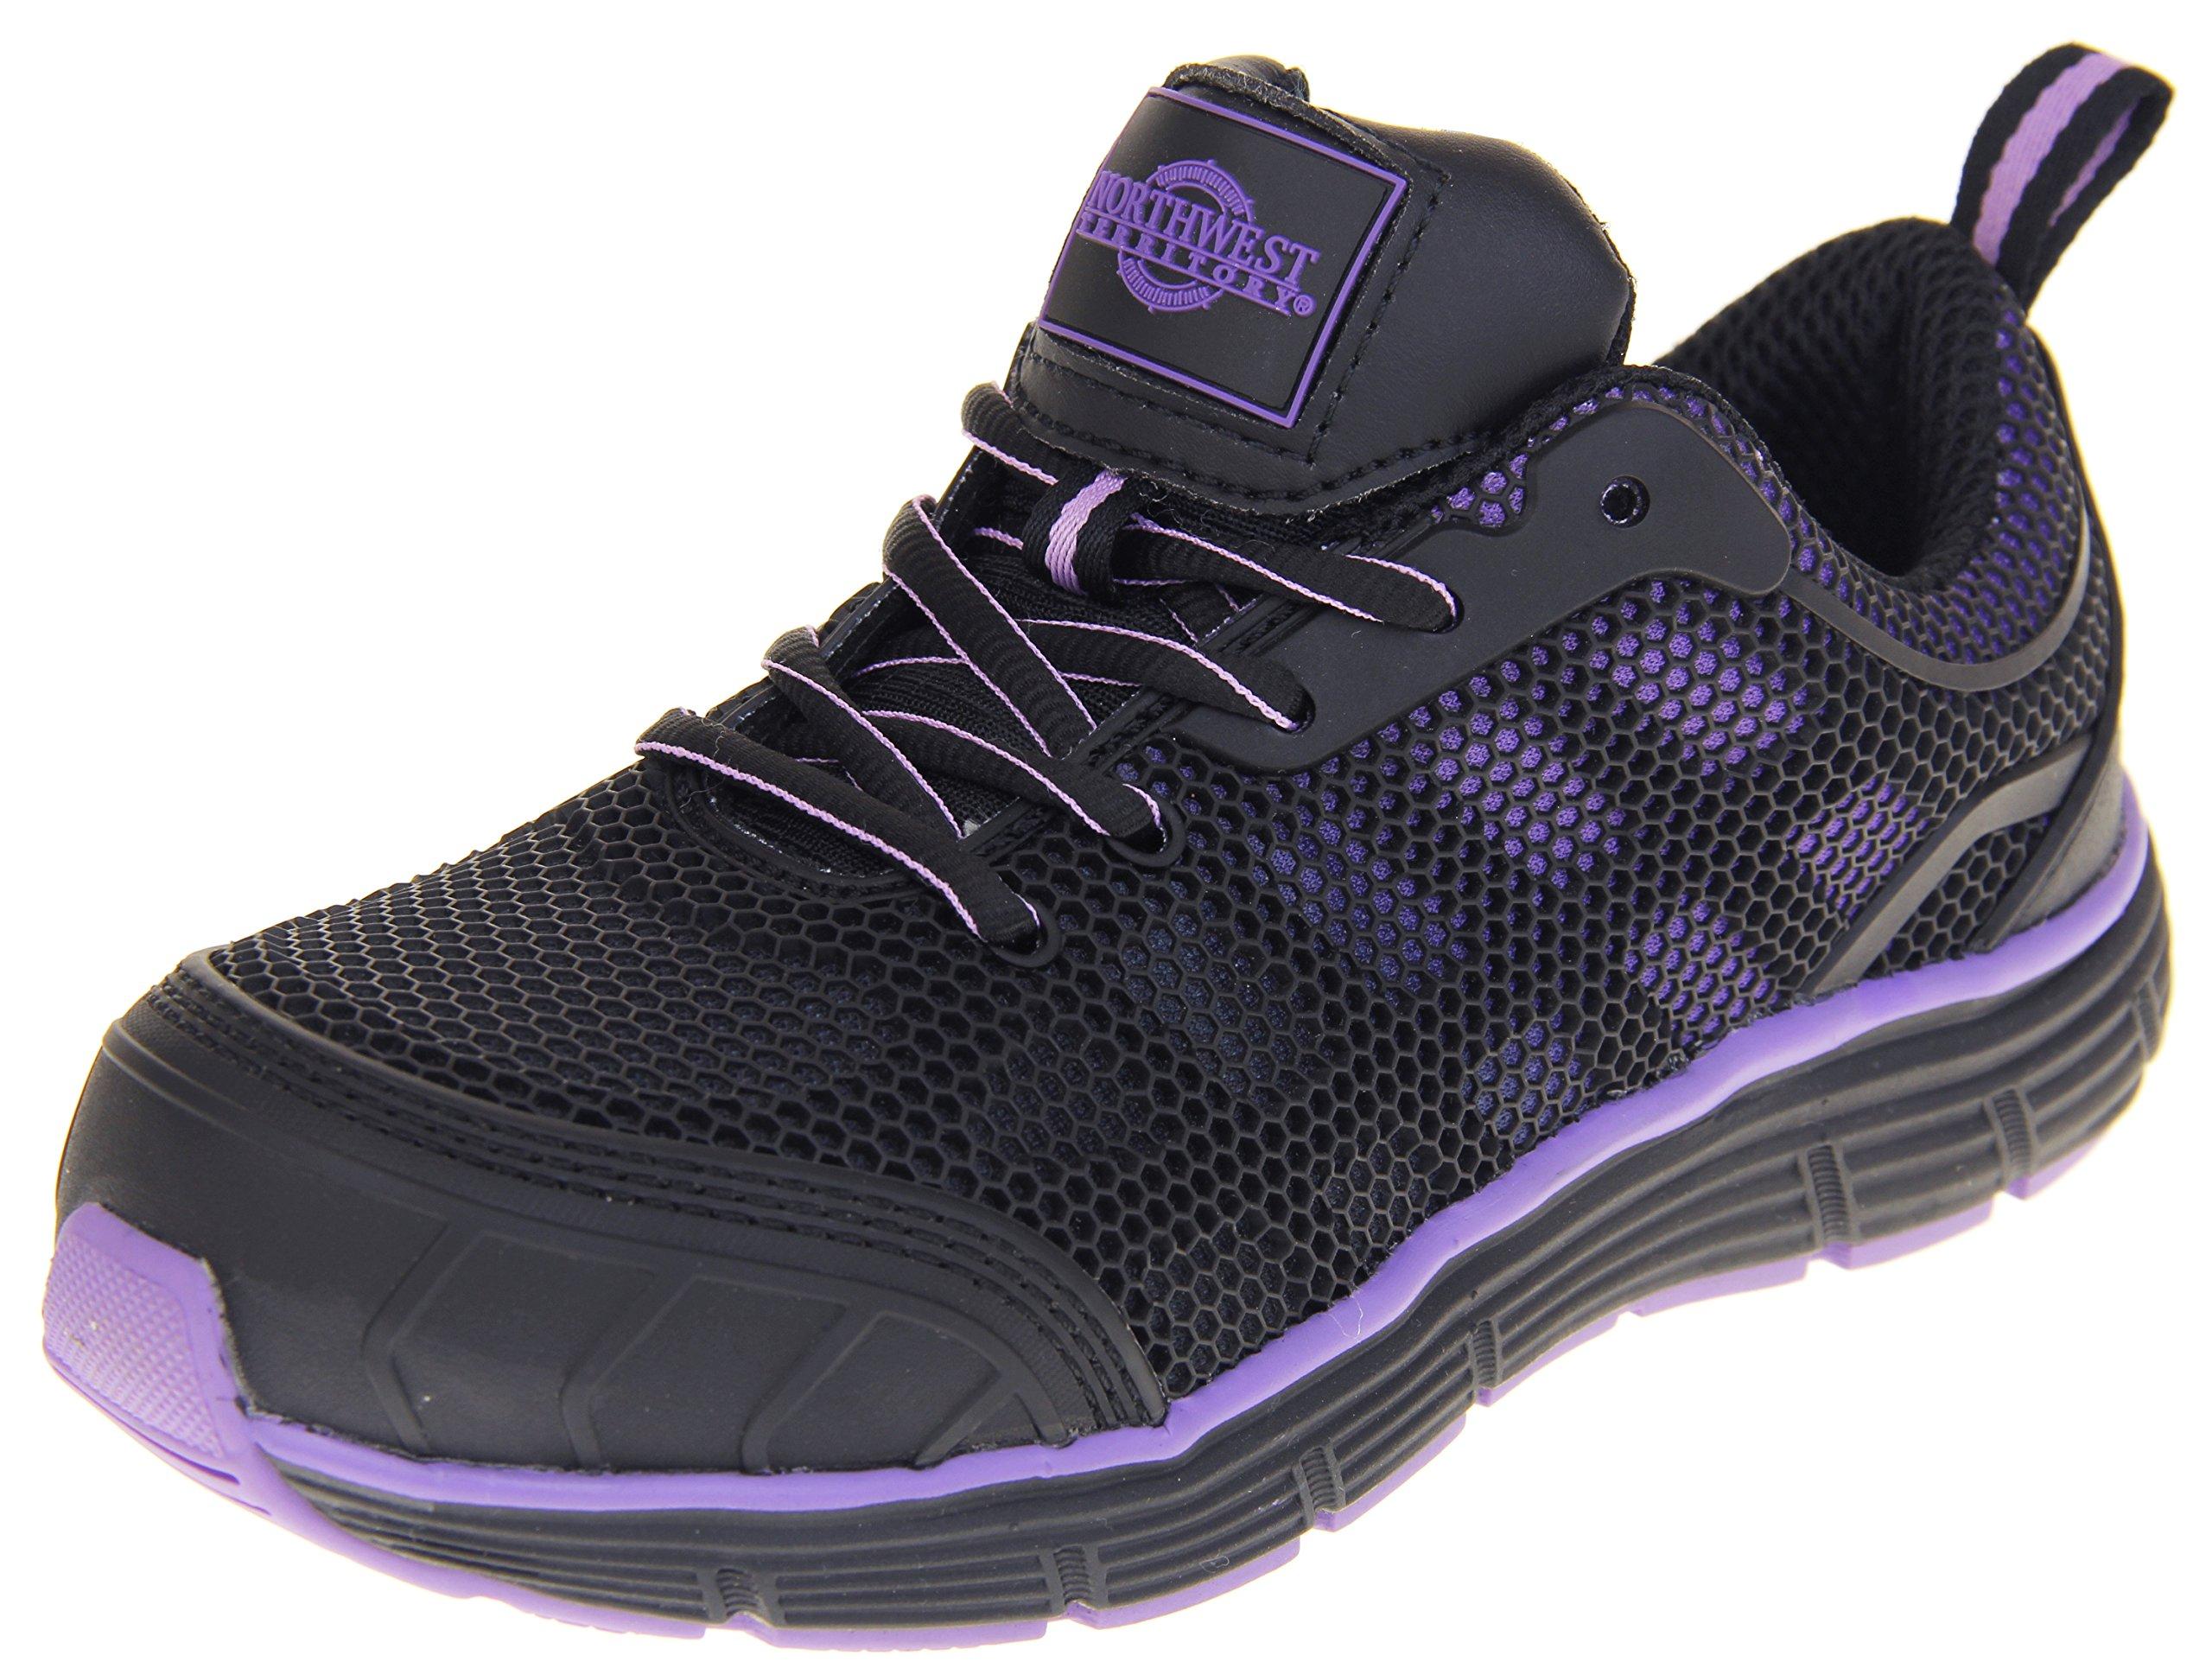 Ladies Northwest Territory Beniah Steel Toe Safety Shoes Black and Purple 7 US